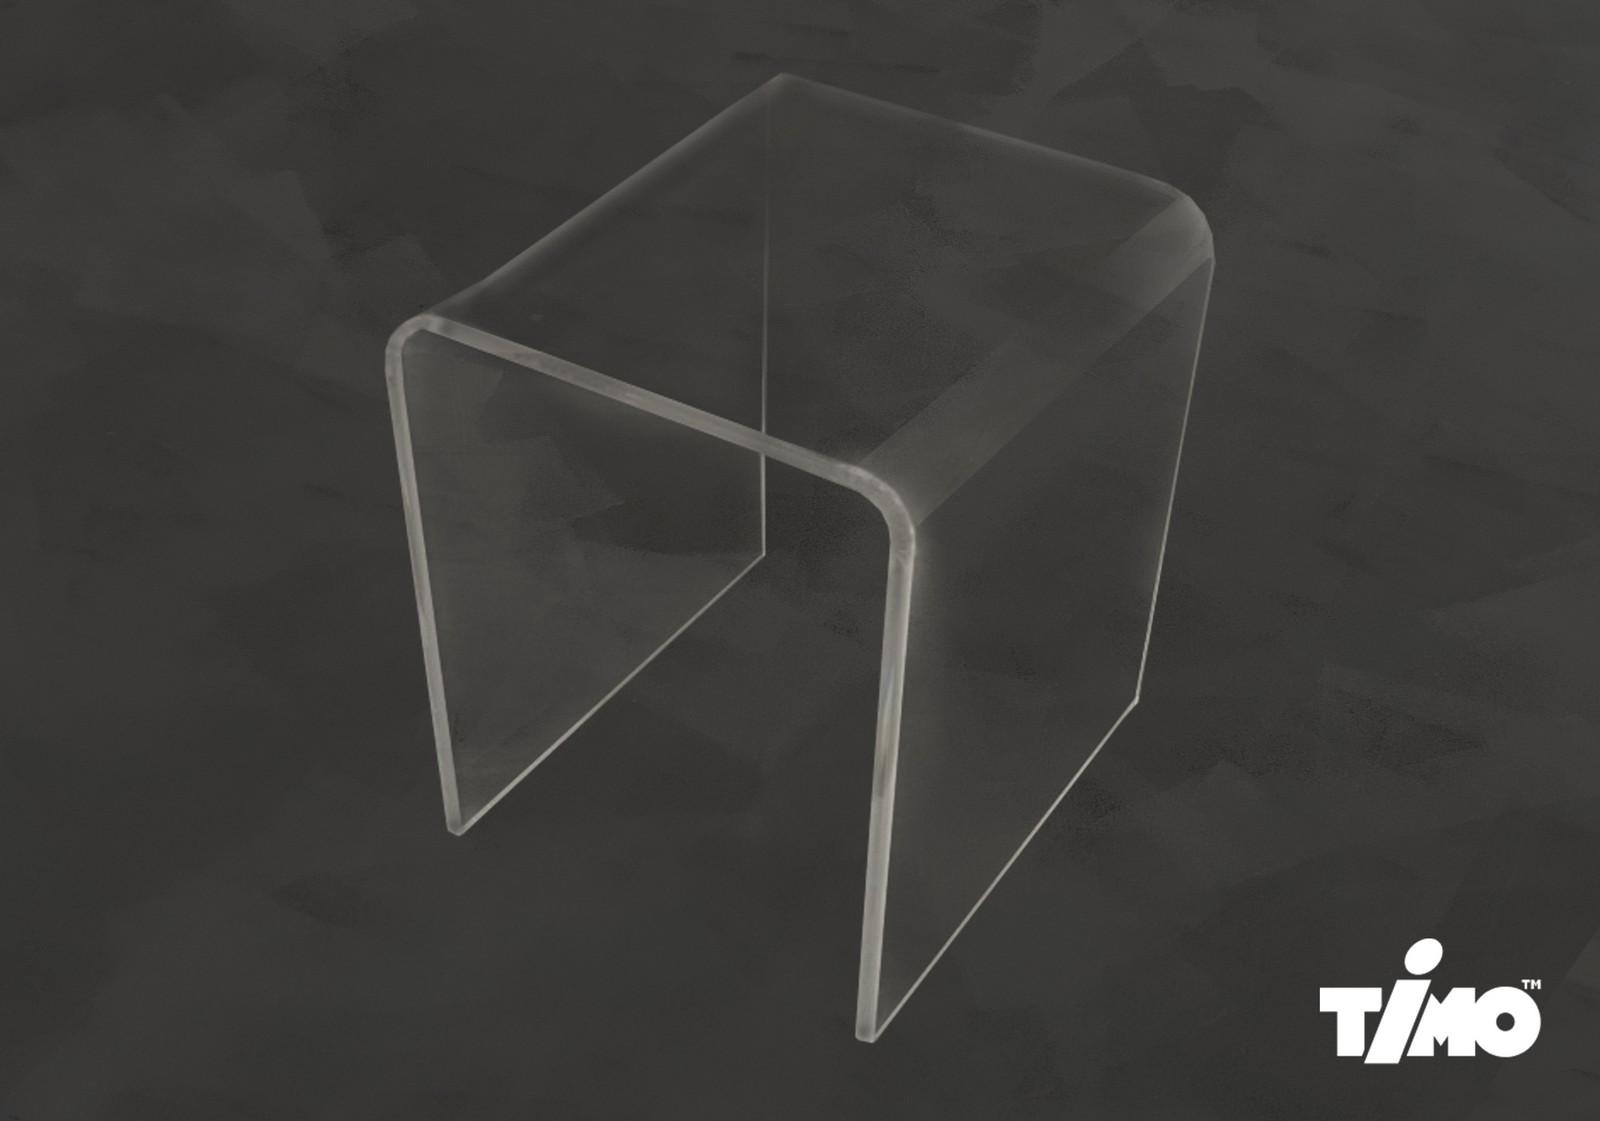 Душевая кабина Timo ILMA 709